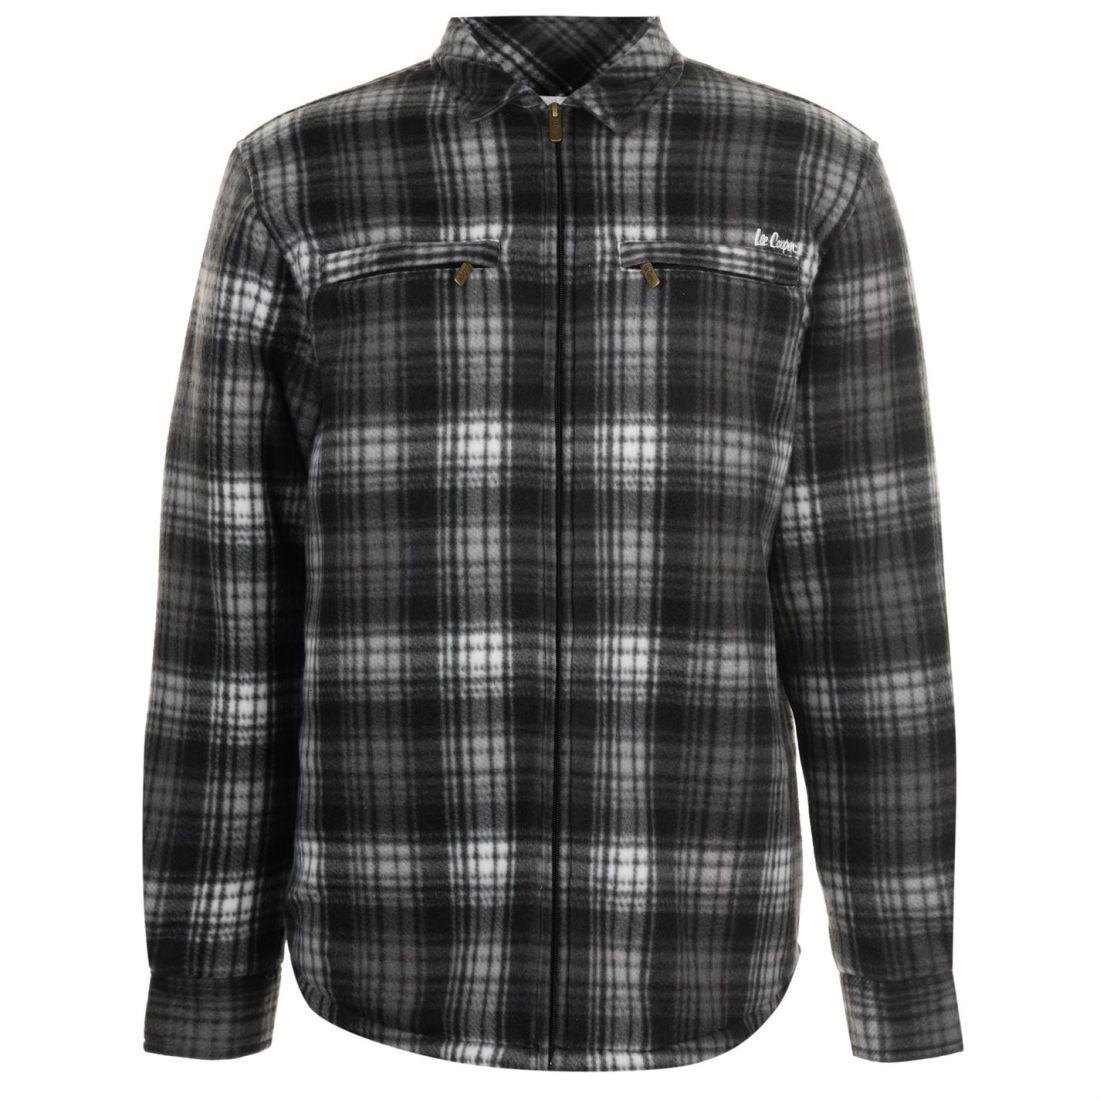 Lee Cooper Fleece Lined Zipped Shirt Mens Gents Full Length Sleeve Everyday Zip